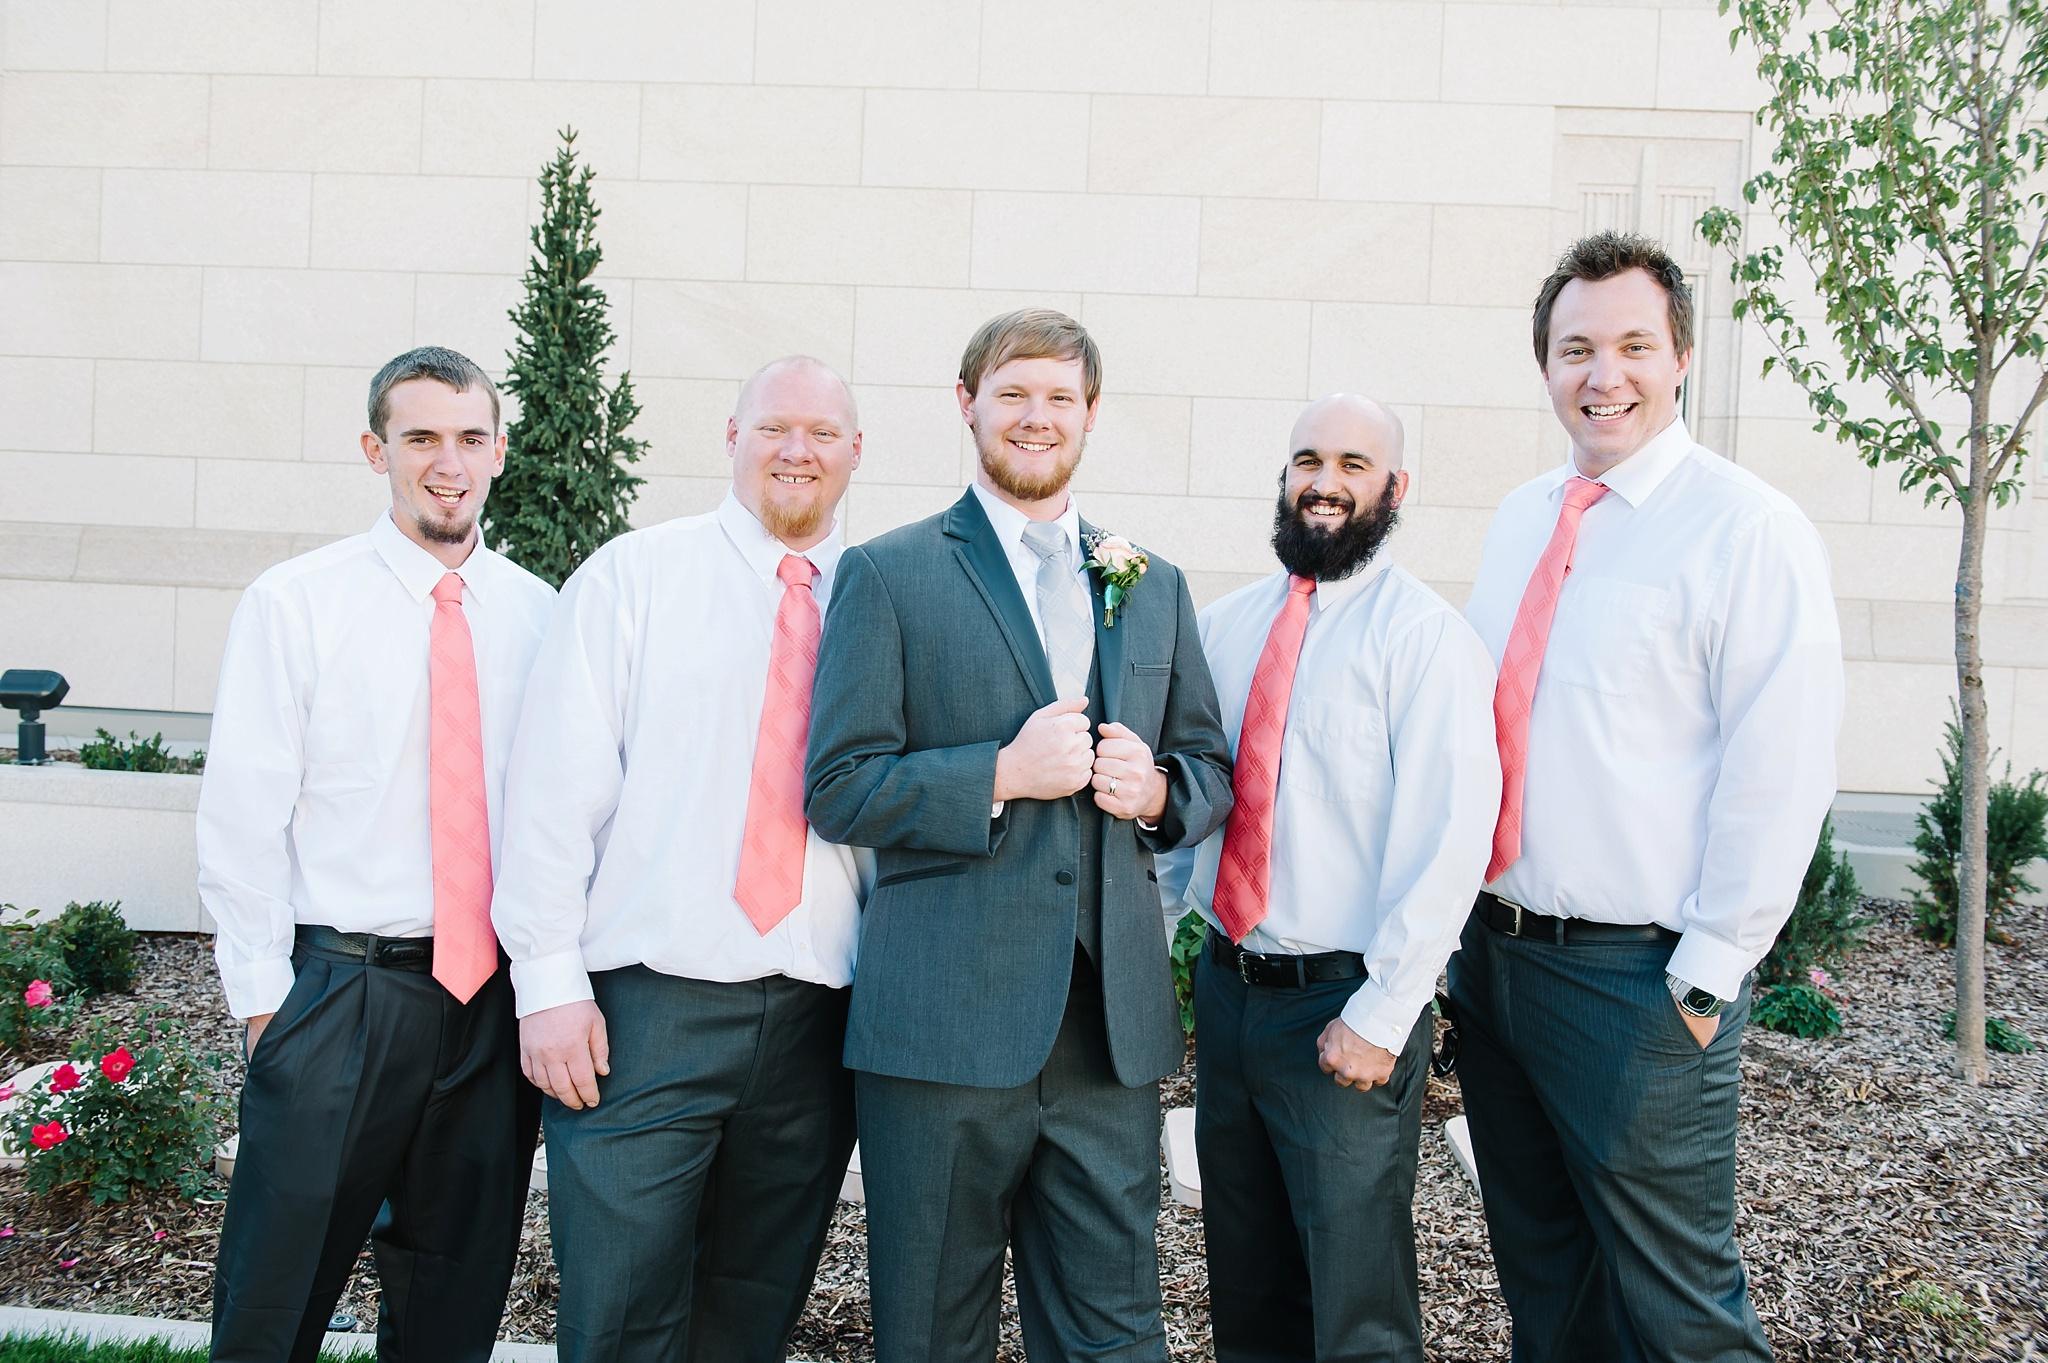 Ogden Utah Wedding Photographer Ali Sumsion 020